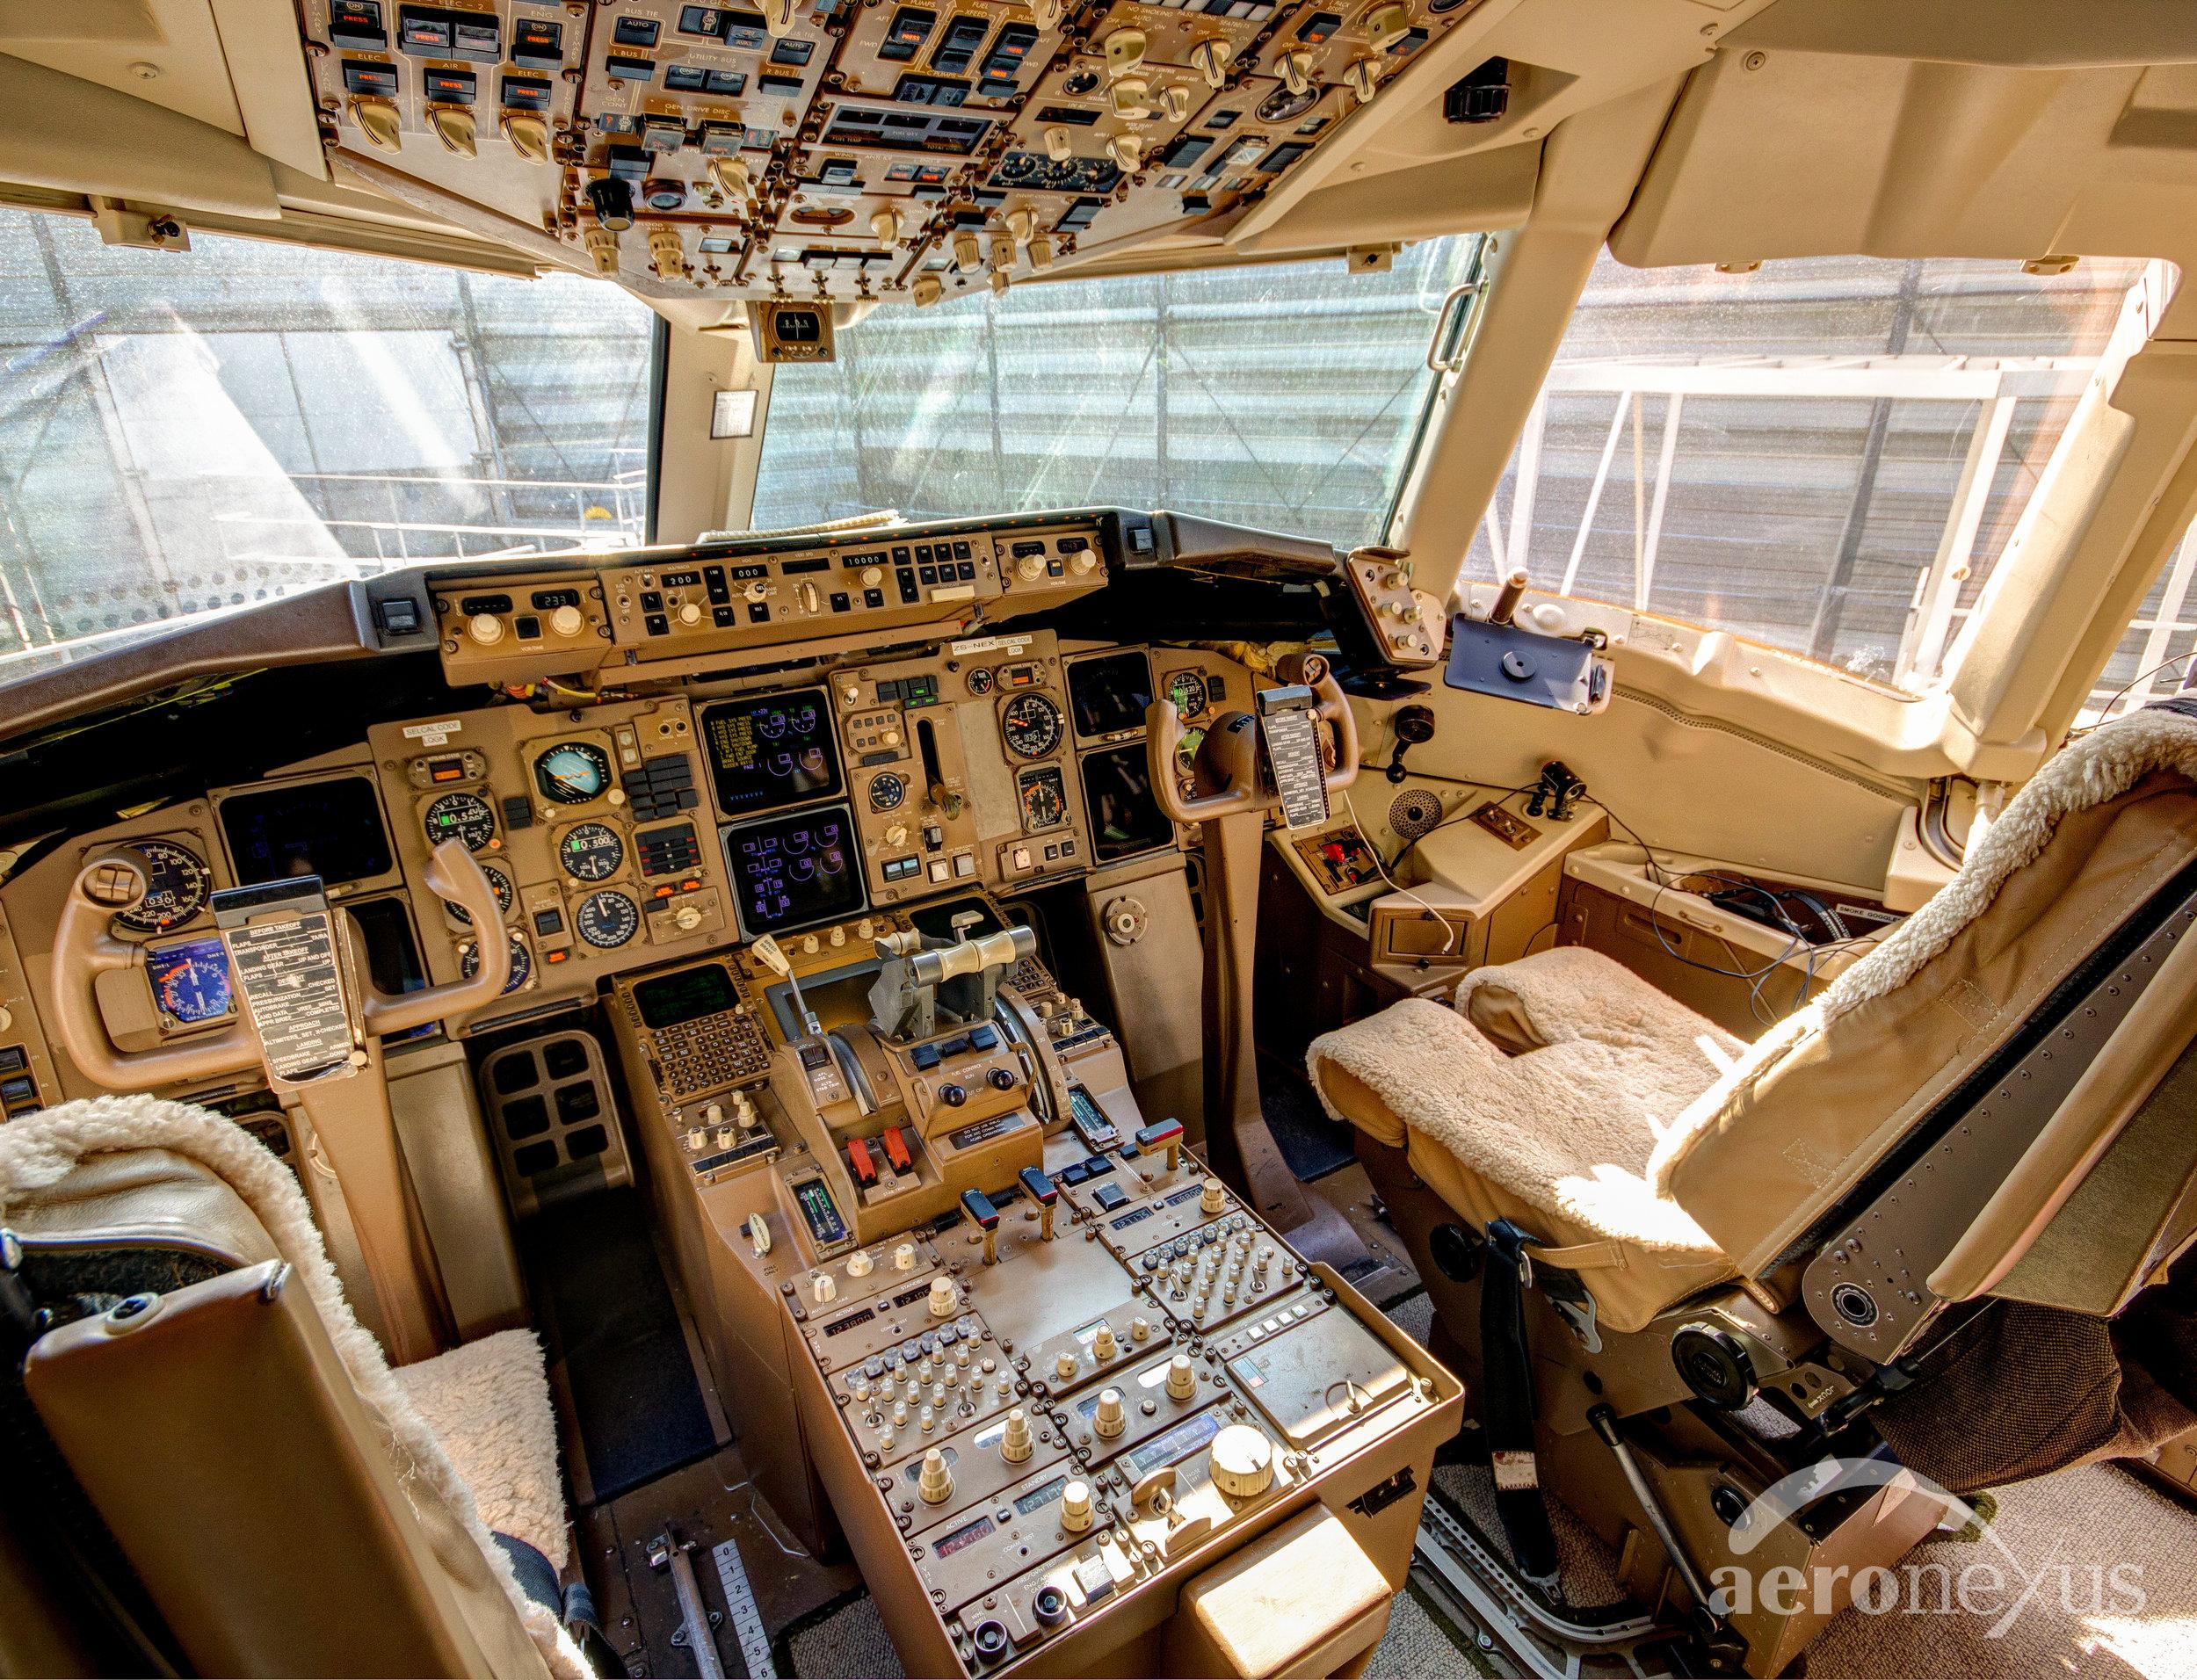 Aeronexus | VIP Boeing 767-300ER | Interior Cockpit